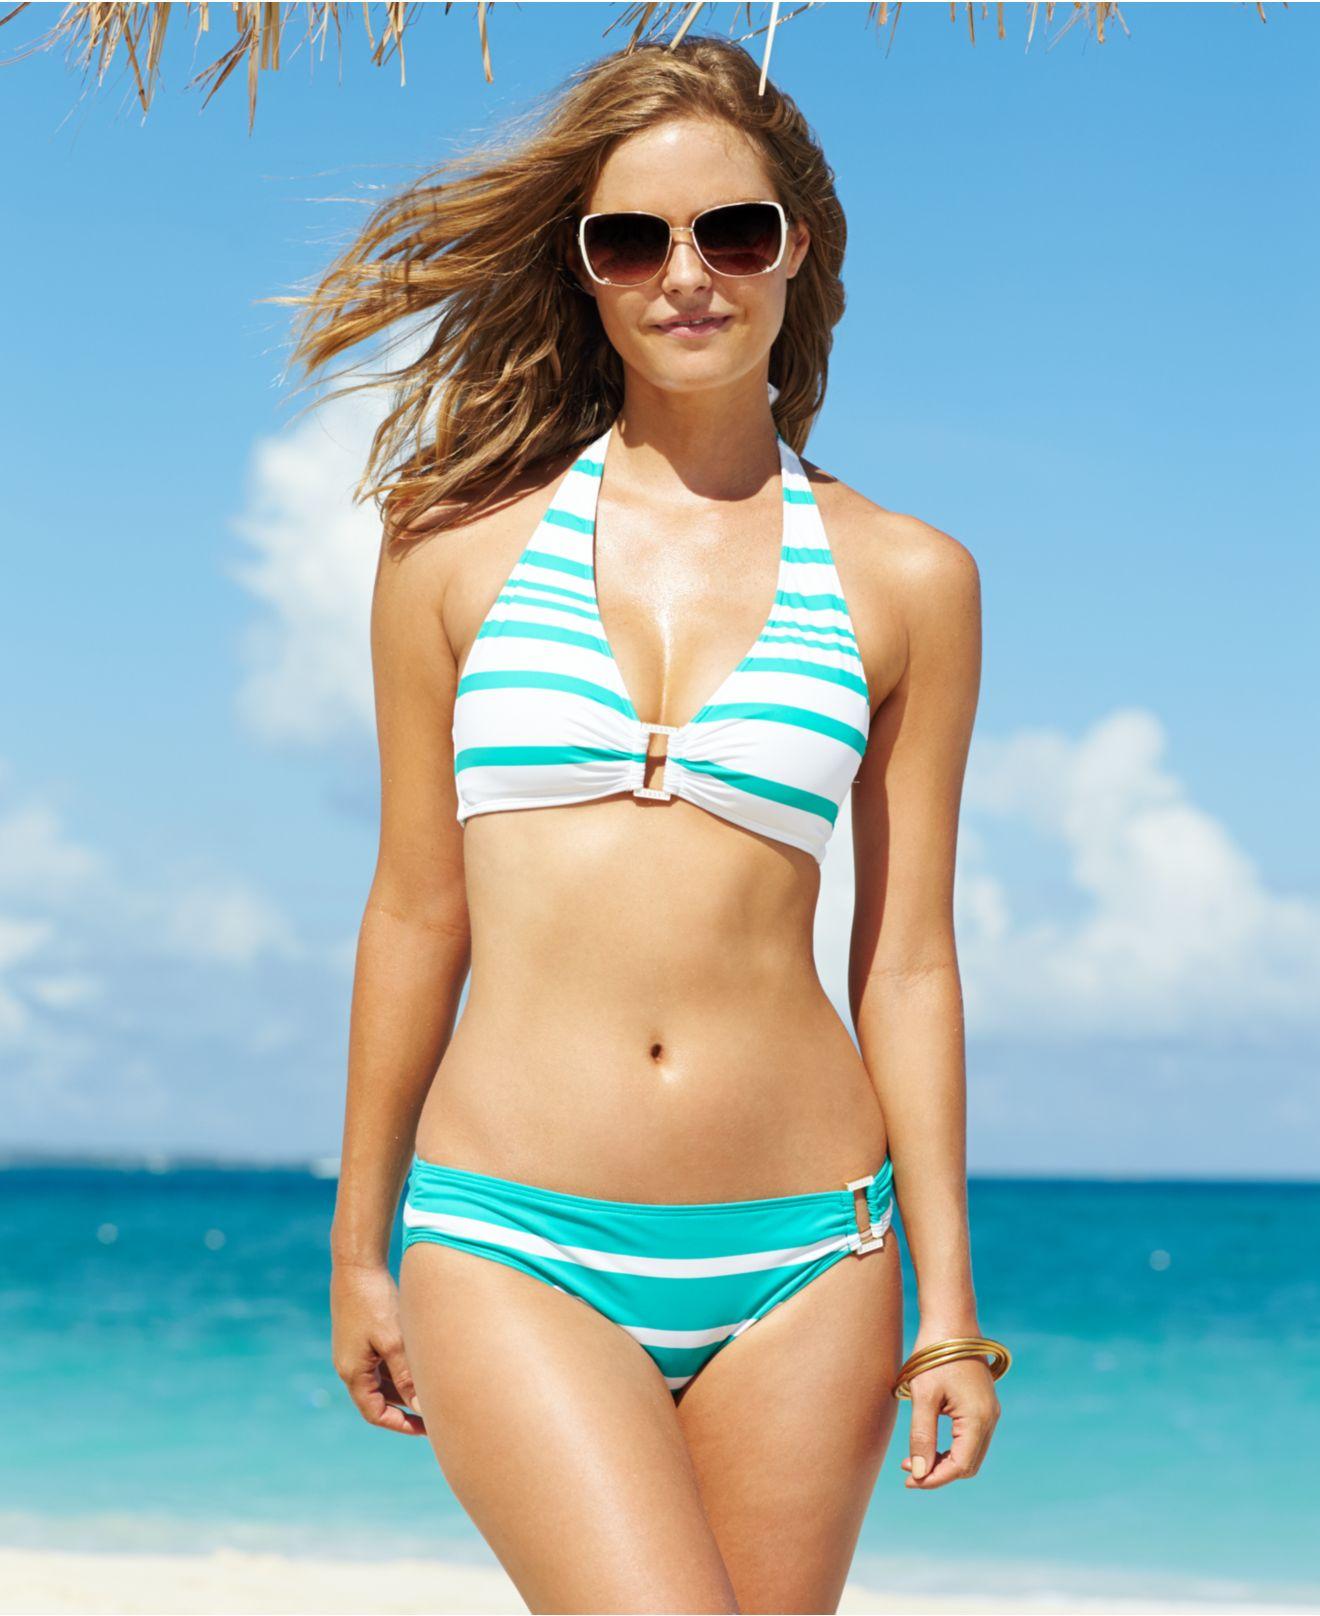 60377756316 Lyst - Lauren by Ralph Lauren Striped Hardware Halter Bikini Top in ...